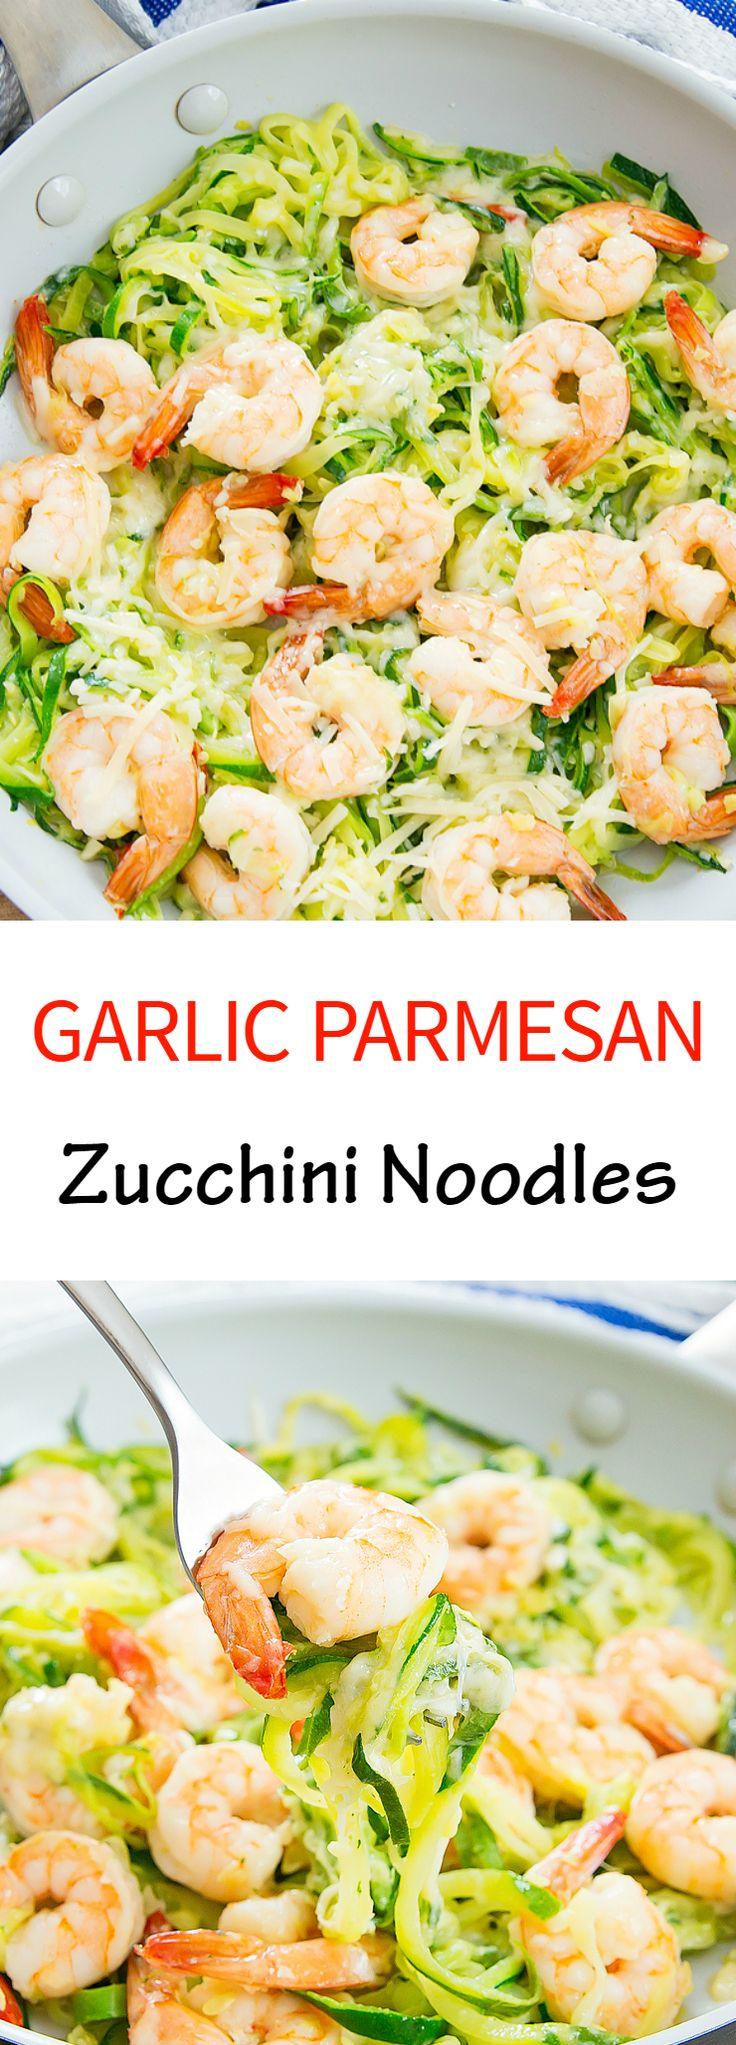 Best 25+ Parmesan zucchini bites ideas on Pinterest   Zucchini bites, Zucchini cheese bites and ...